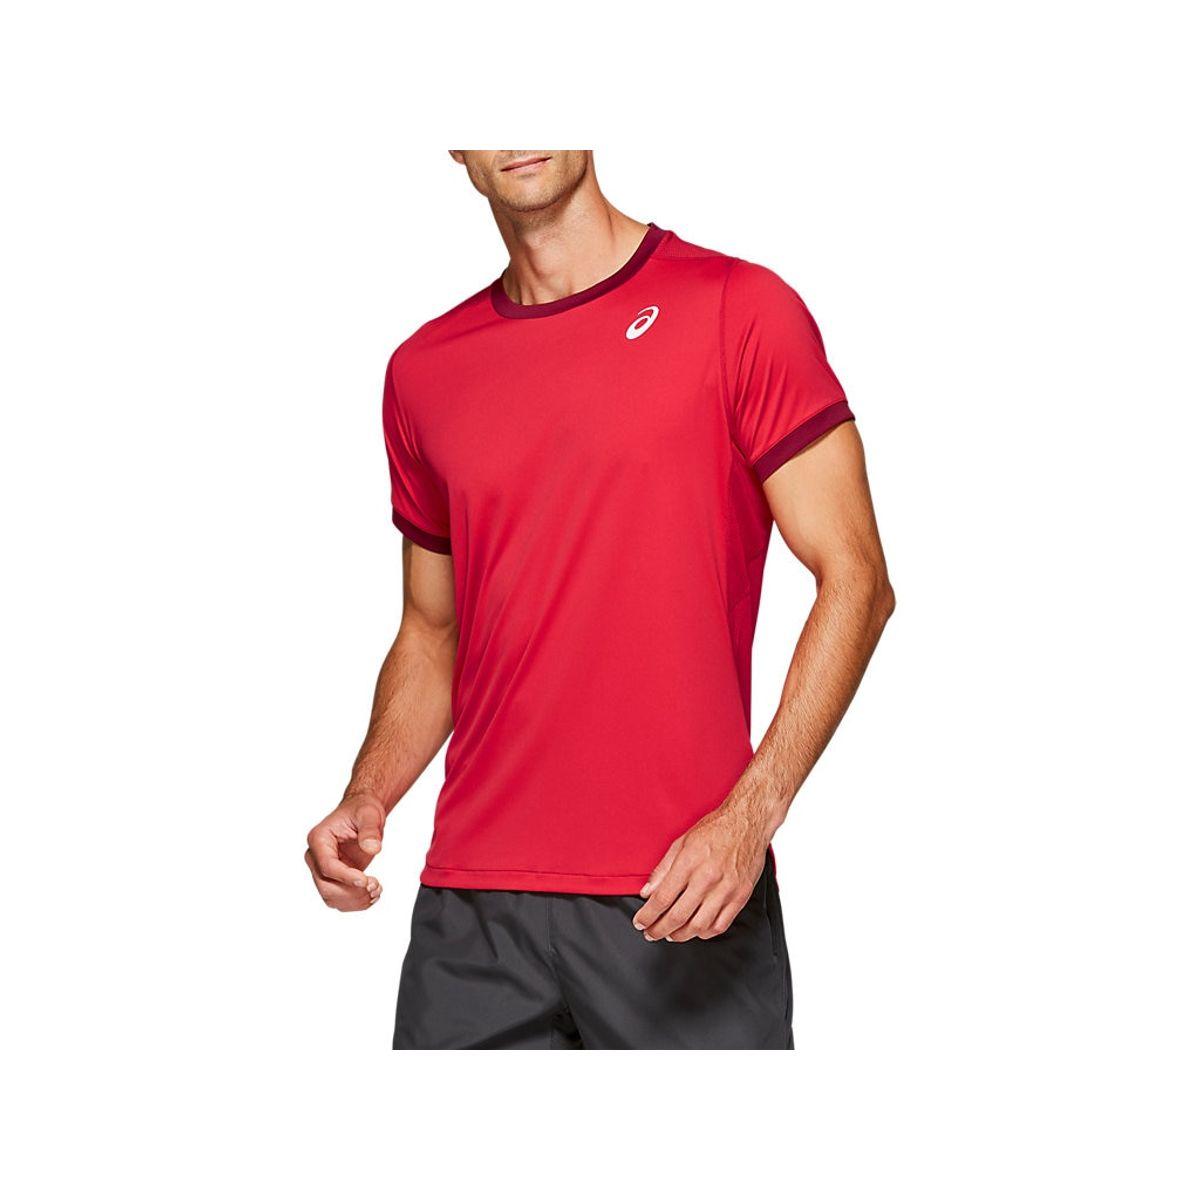 Camiseta-Asics-Short-Sleeve---Masculino---Vermelho